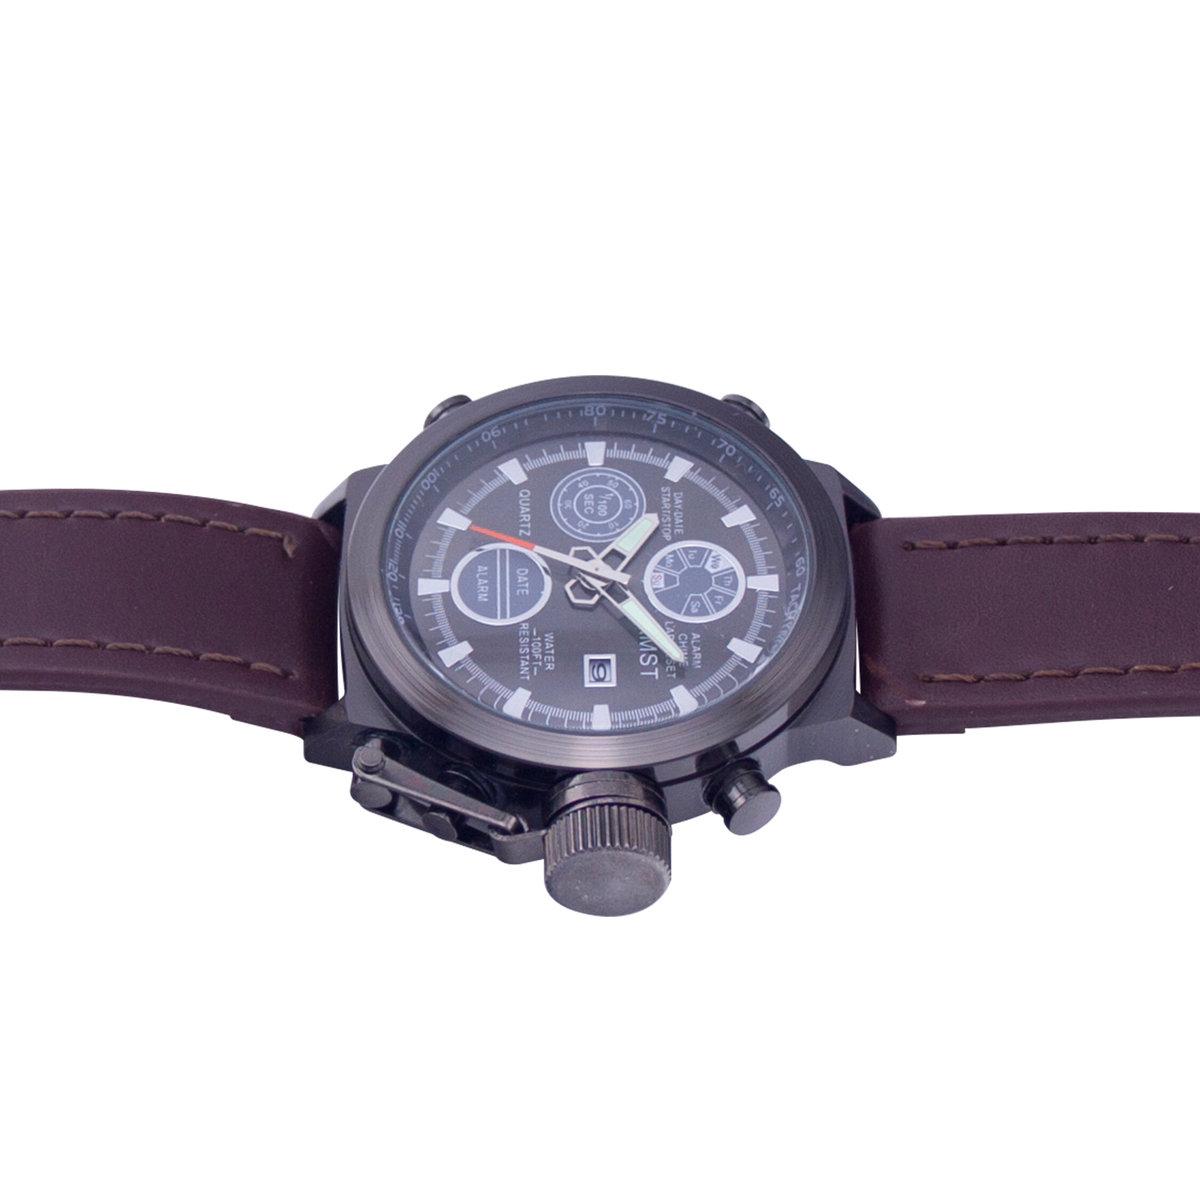 Скидка до 51% на армейские часы